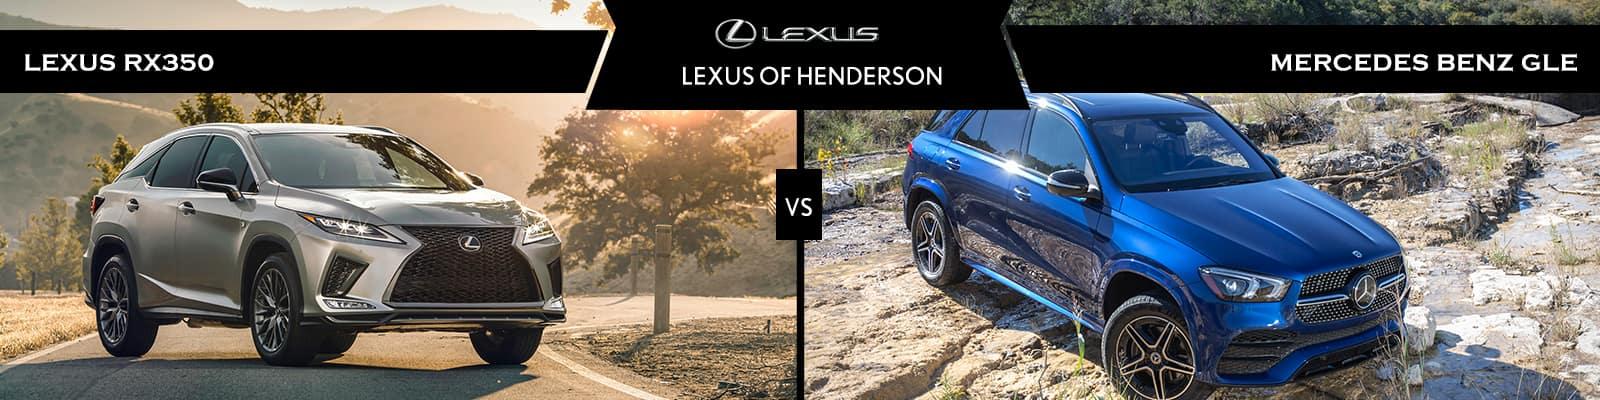 Lexus RX 350 vs Mercedes-Benz GLE